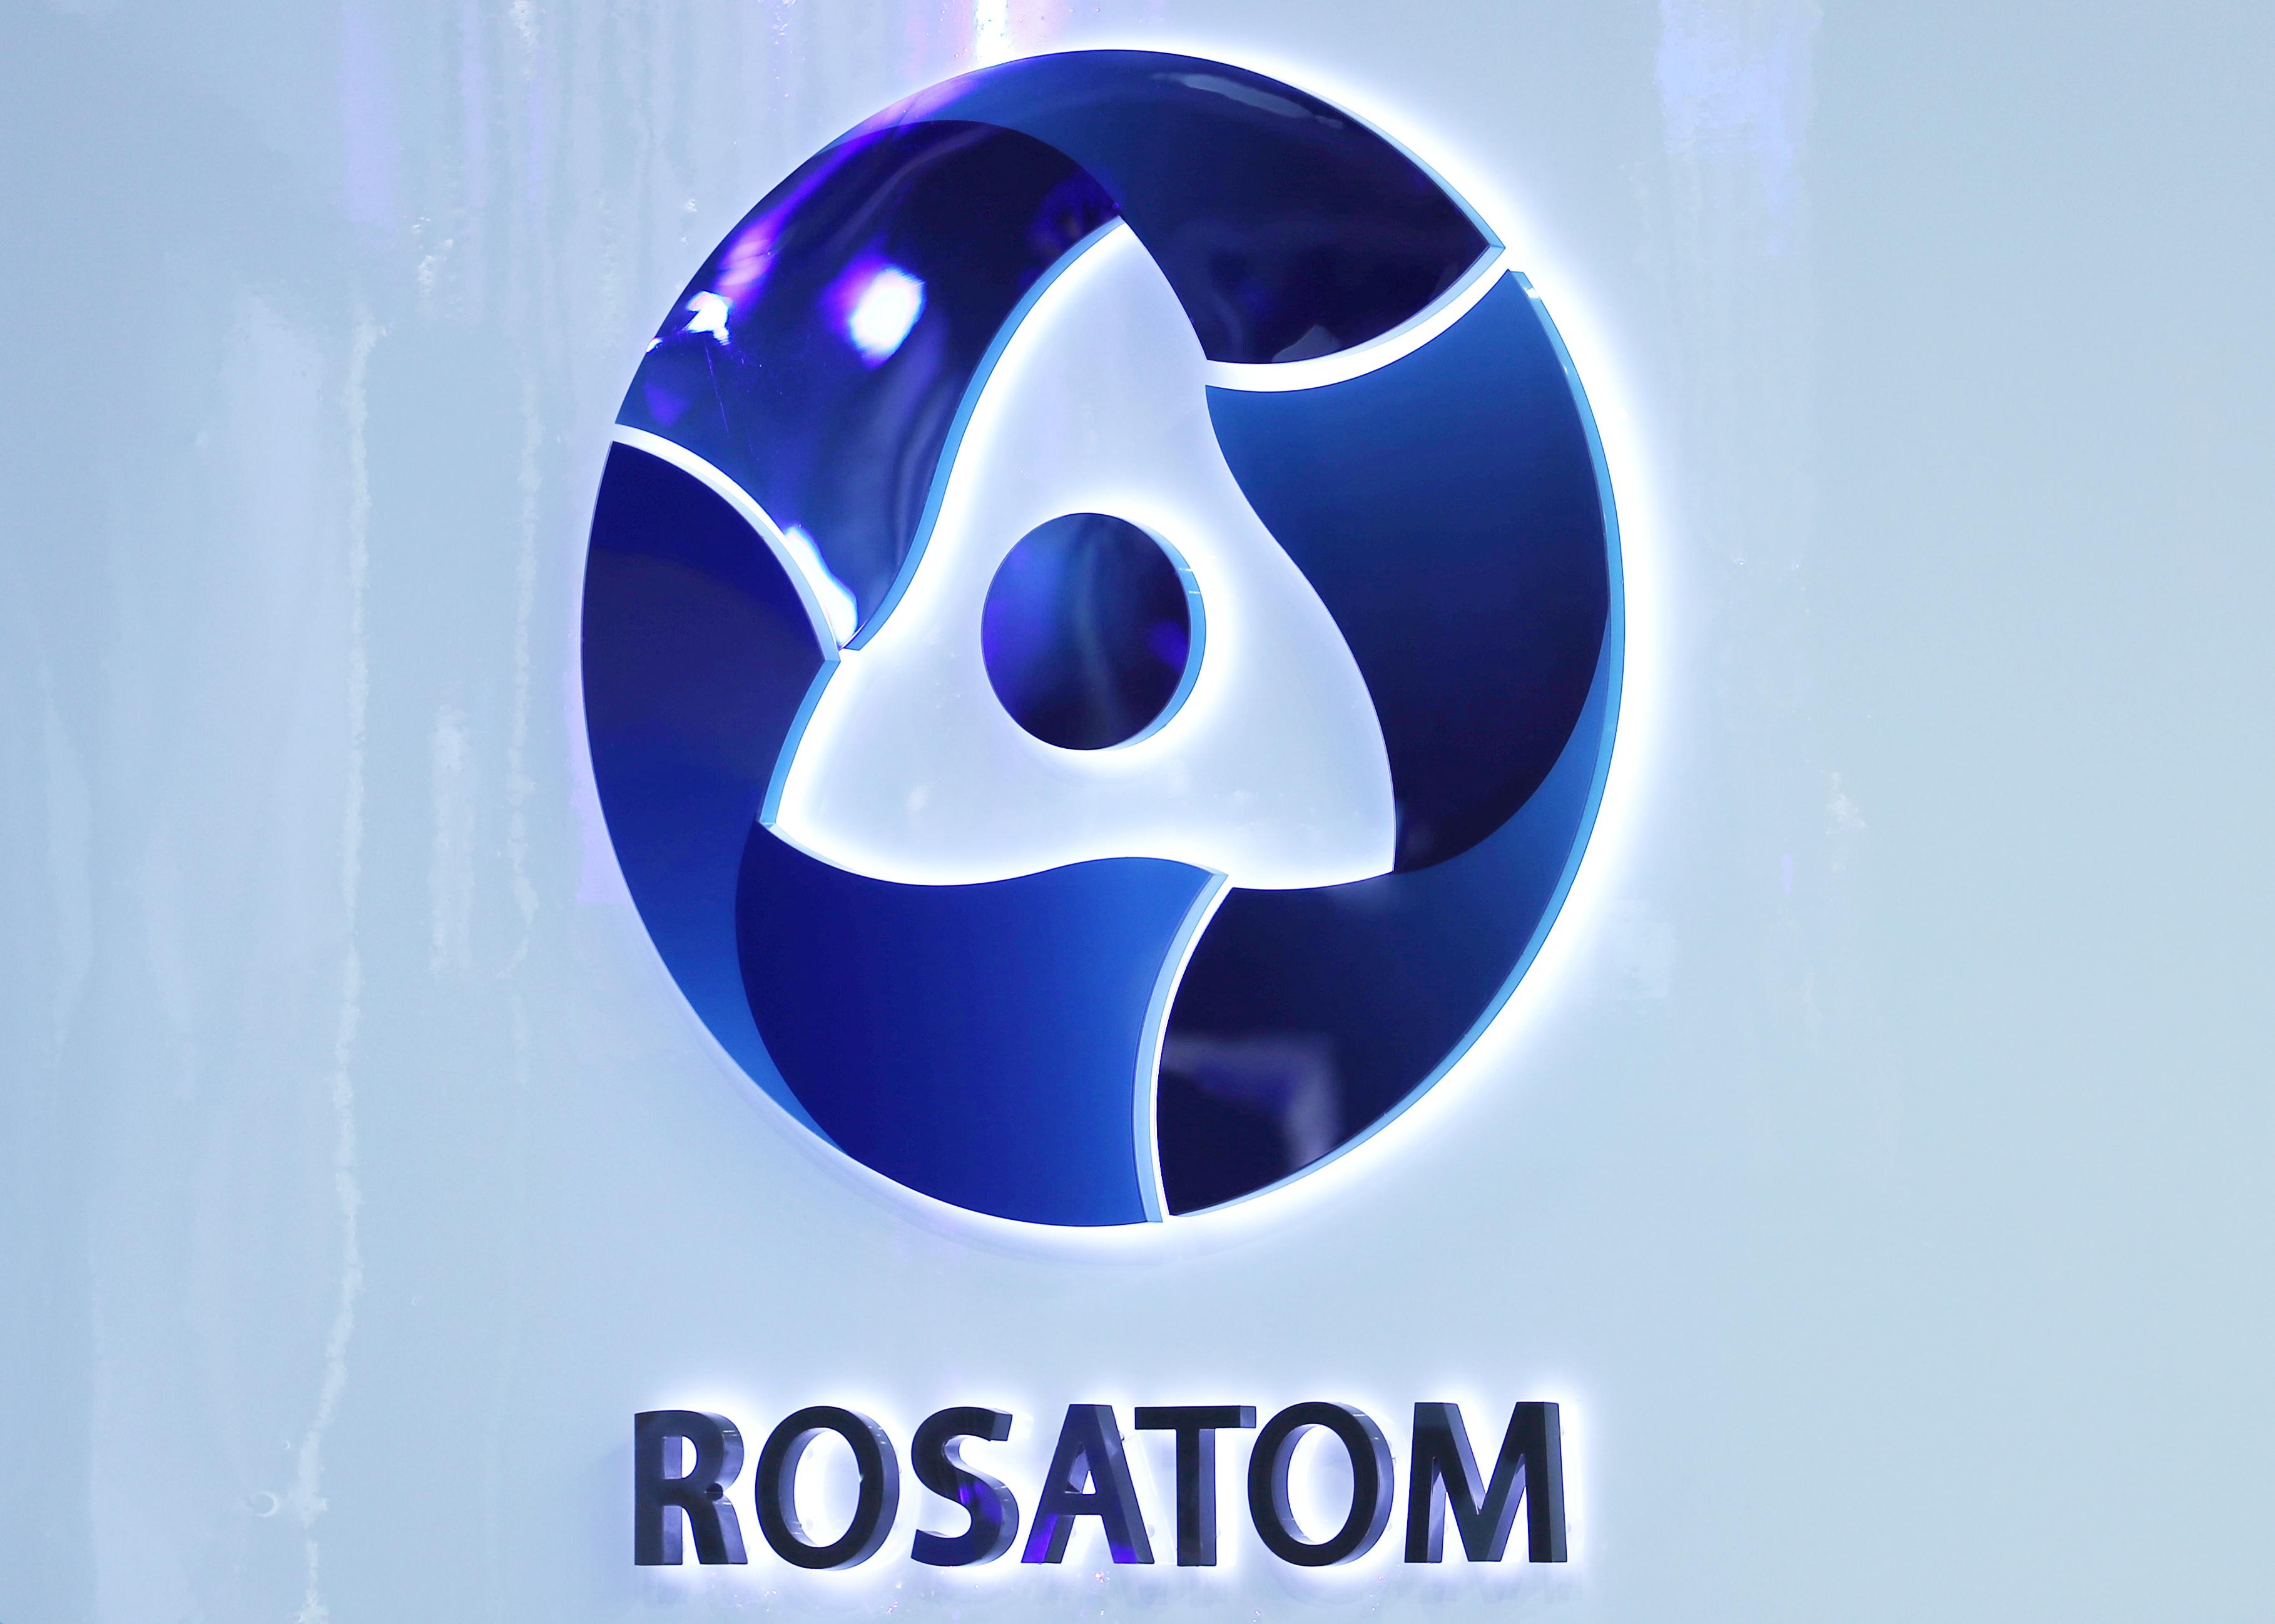 The logo of Rosatom corporation is seen at the St. Petersburg International Economic Forum (SPIEF) in Saint Petersburg, Russia, June 3, 2021. REUTERS/Evgenia Novozhenina